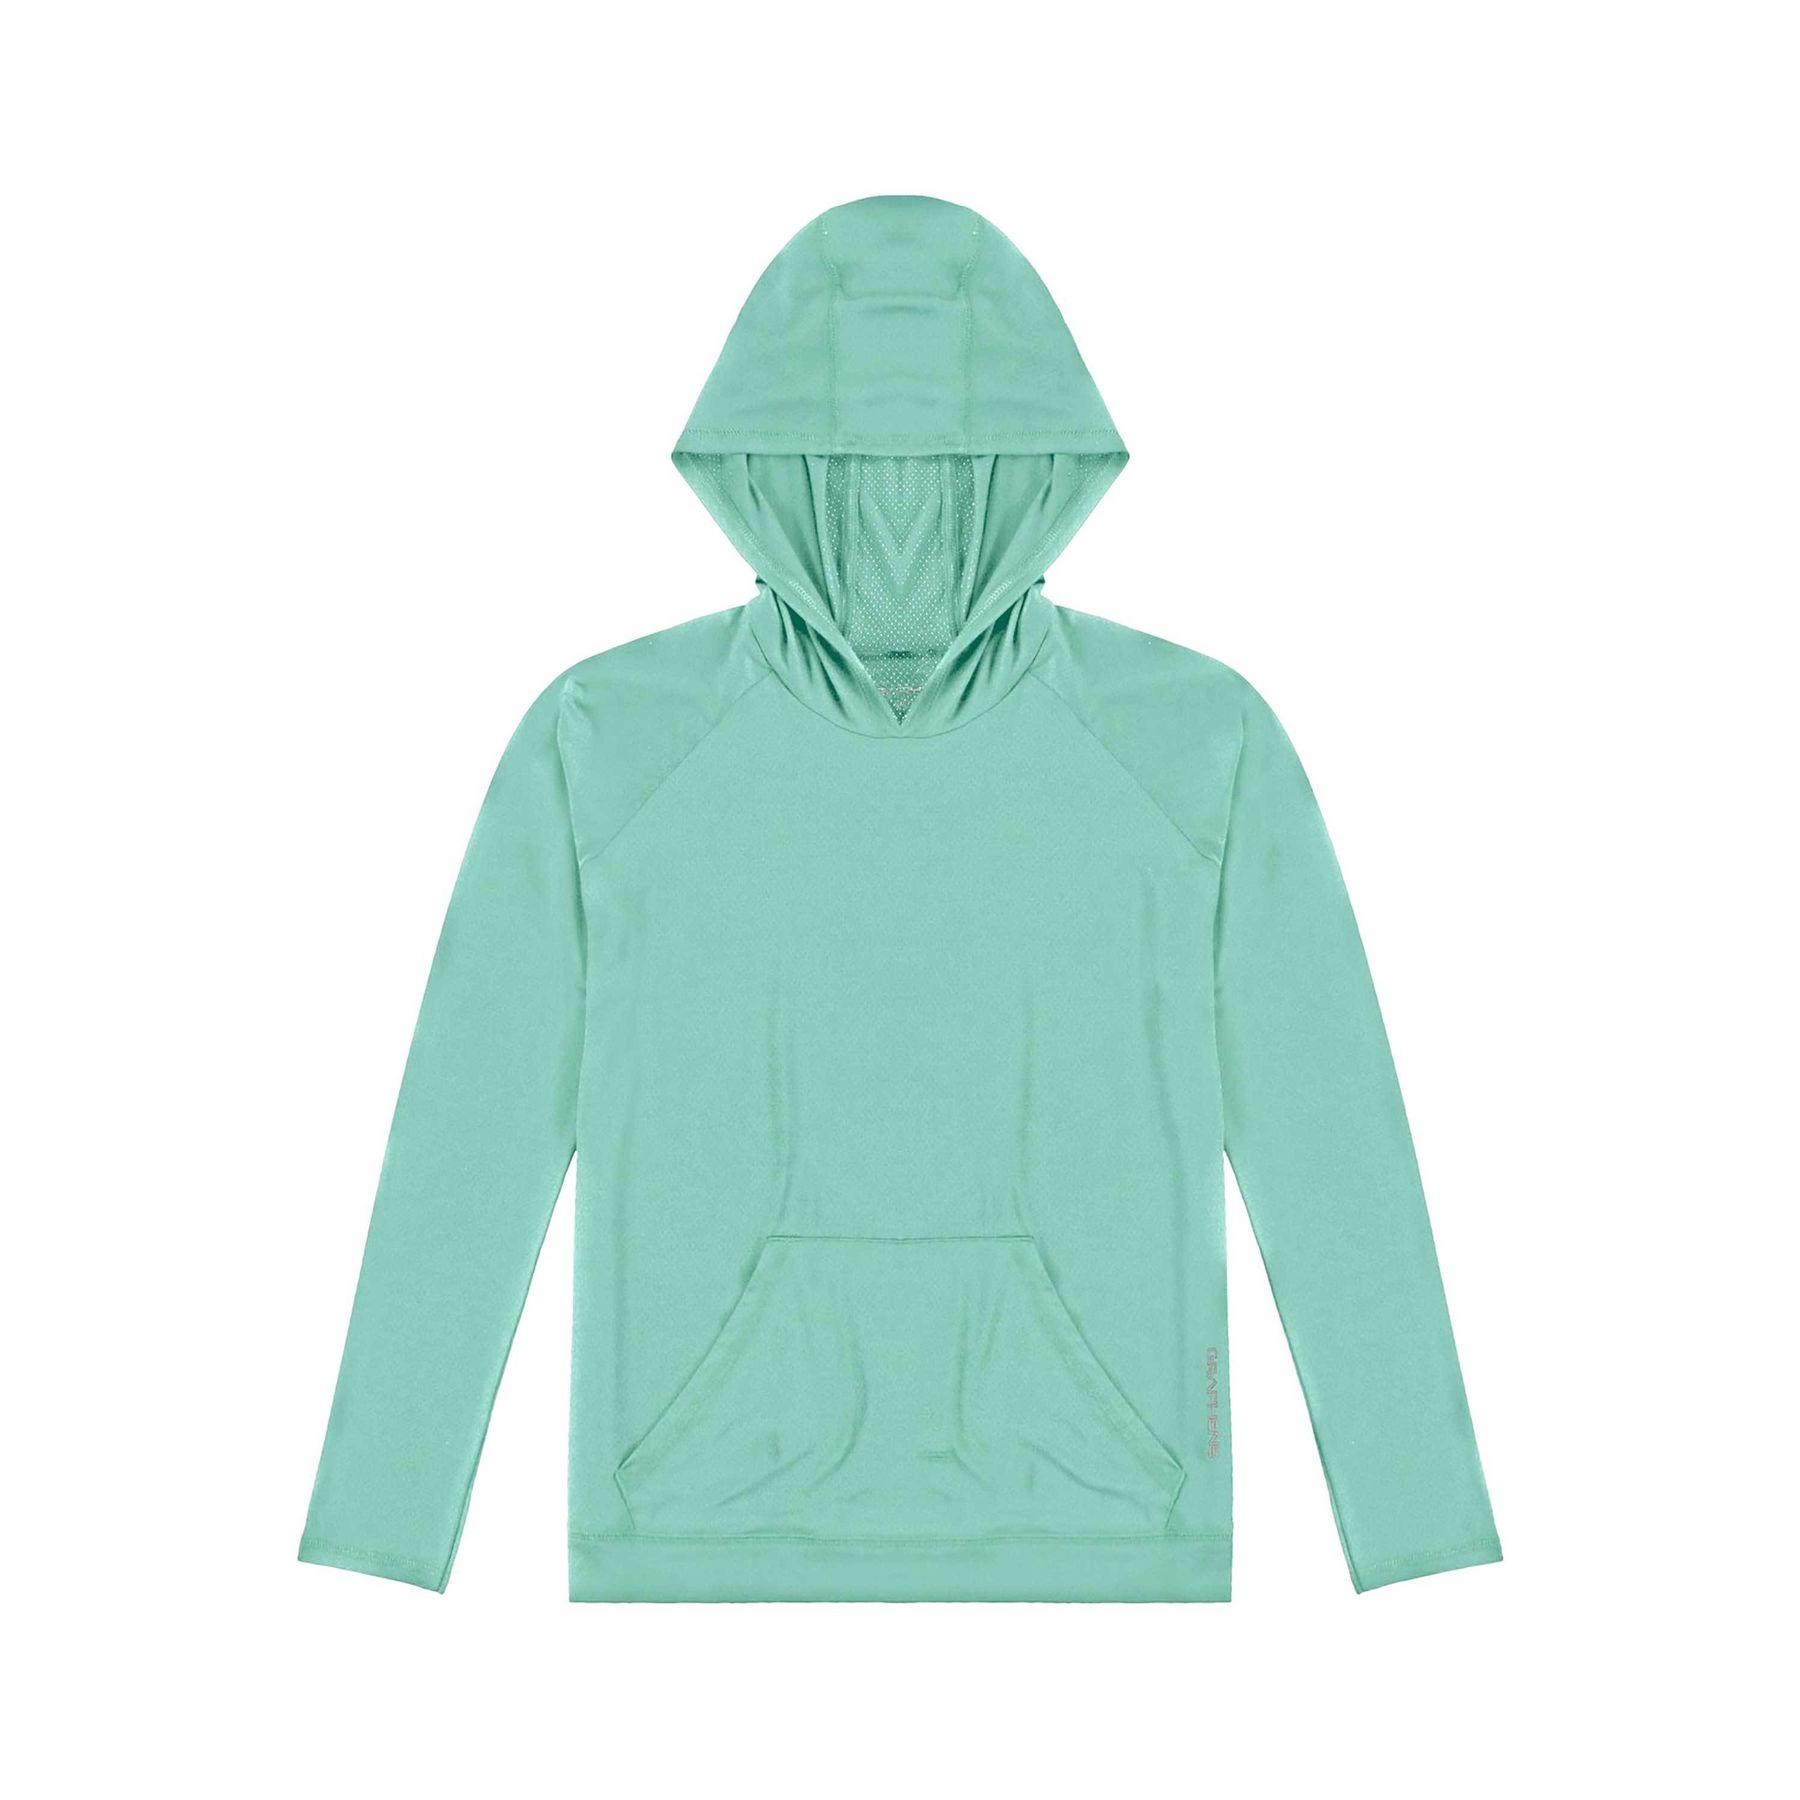 Camiseta Graphene Malha Feminina Verde Água